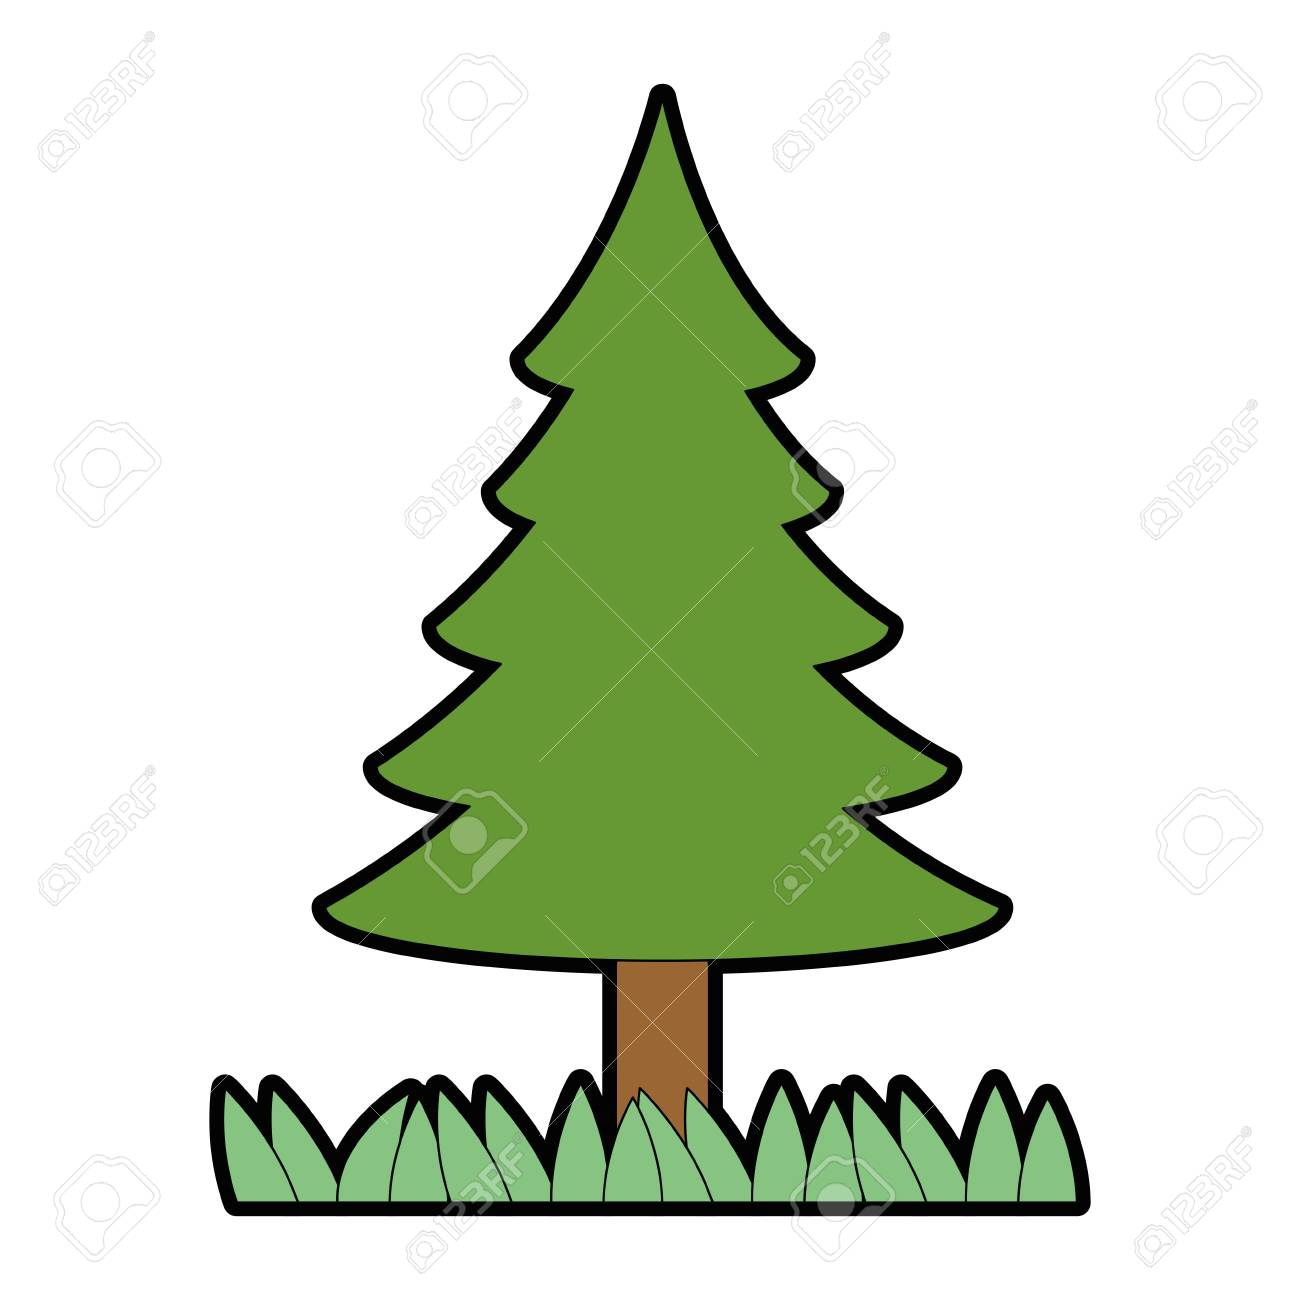 pine tree plant isolated icon vector illustration graphic design rh 123rf com pine tree graphic art pine tree graphic art